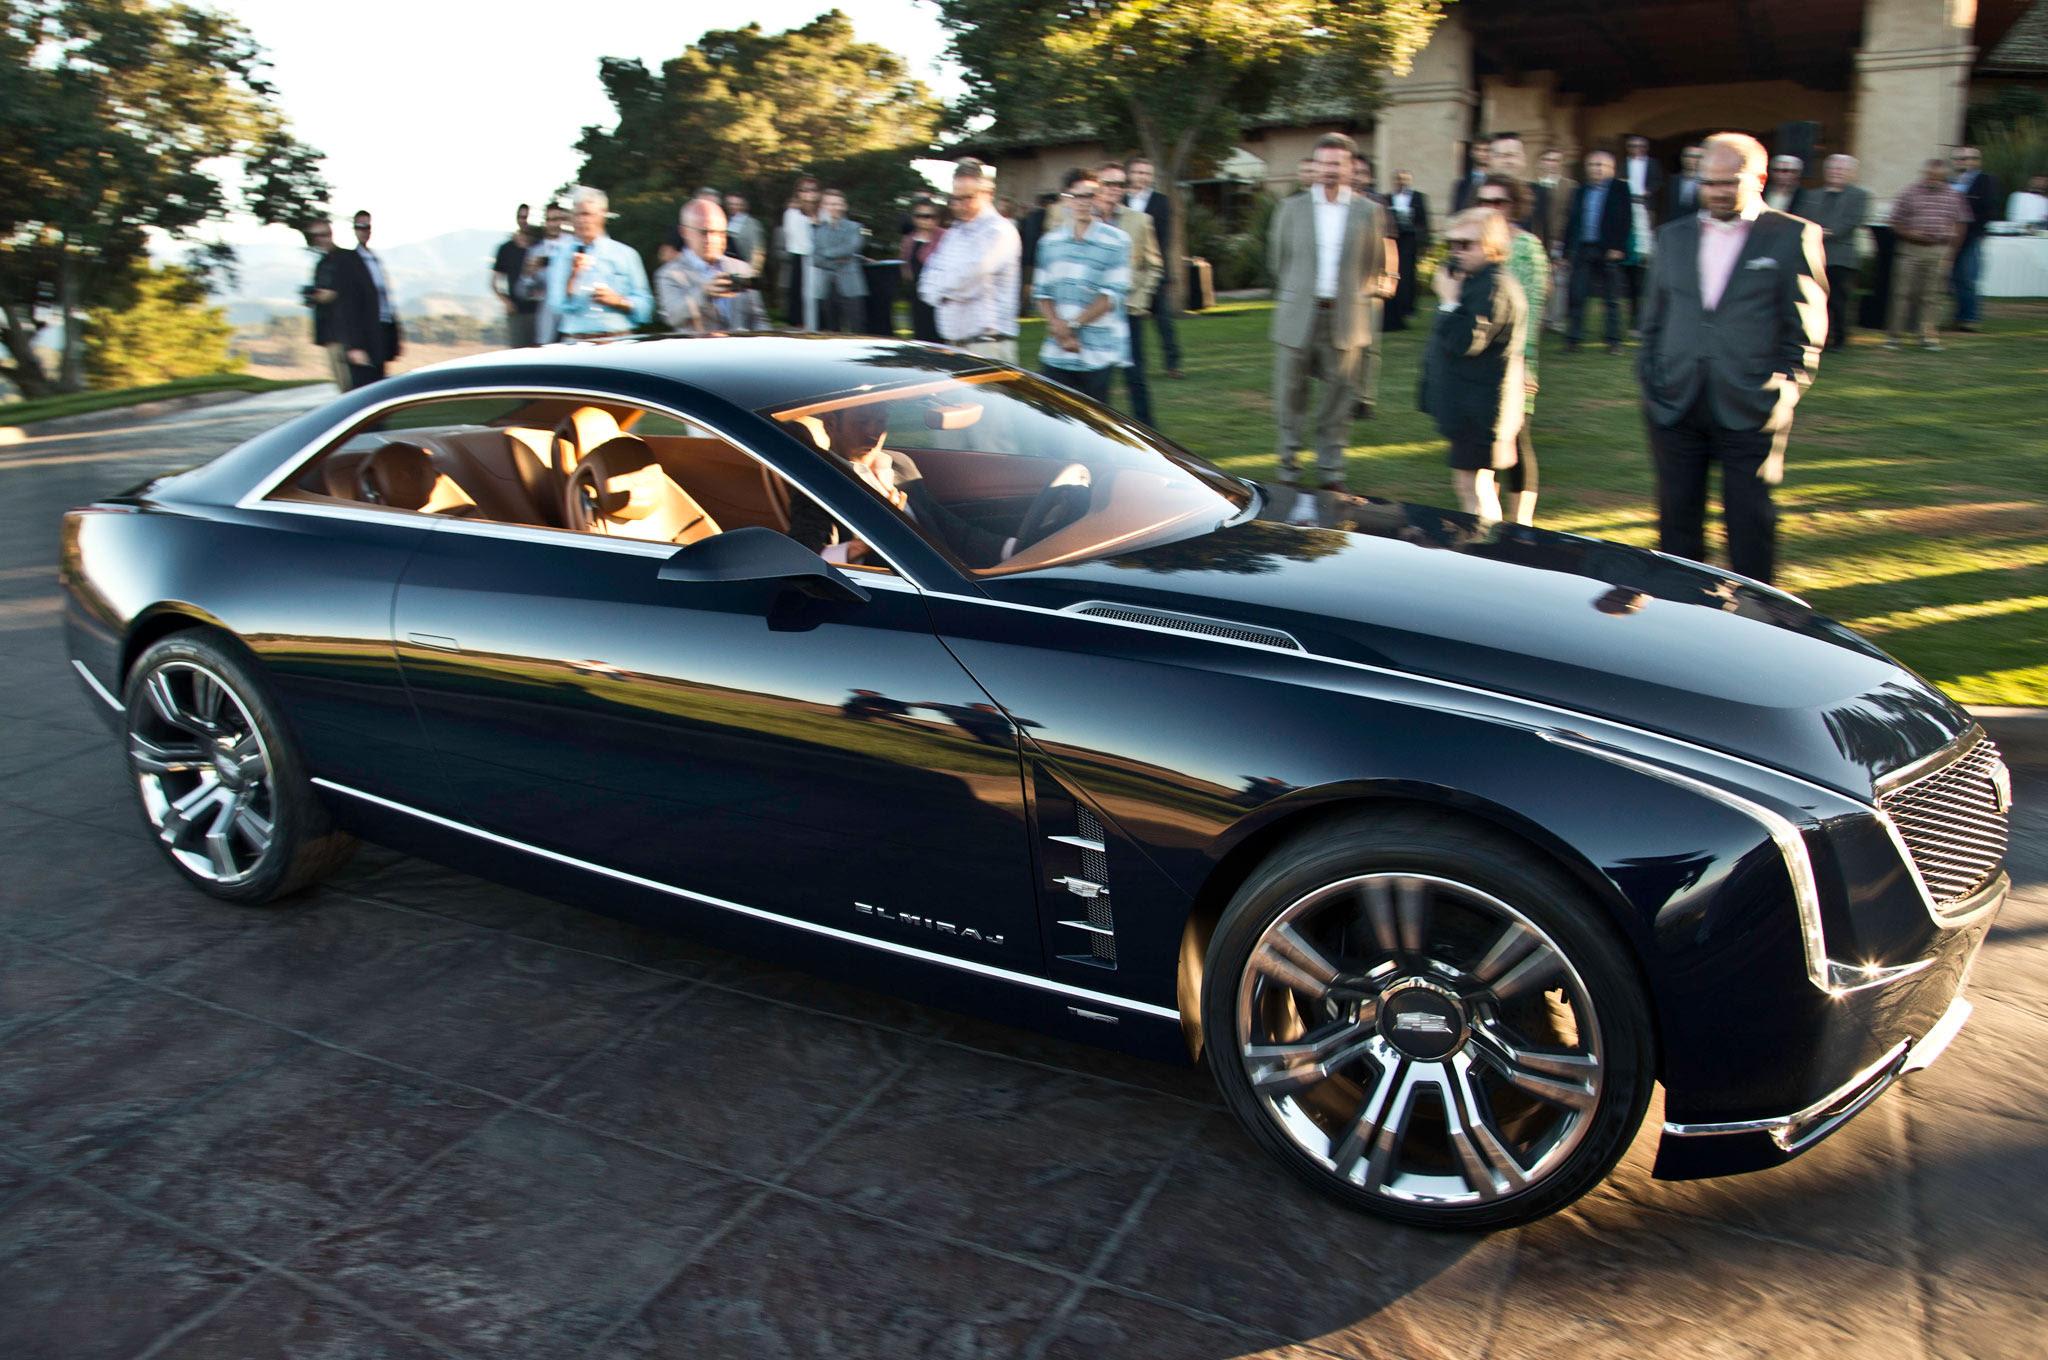 Cadillac Readying Luxury Car, Convertible, and ATS-V